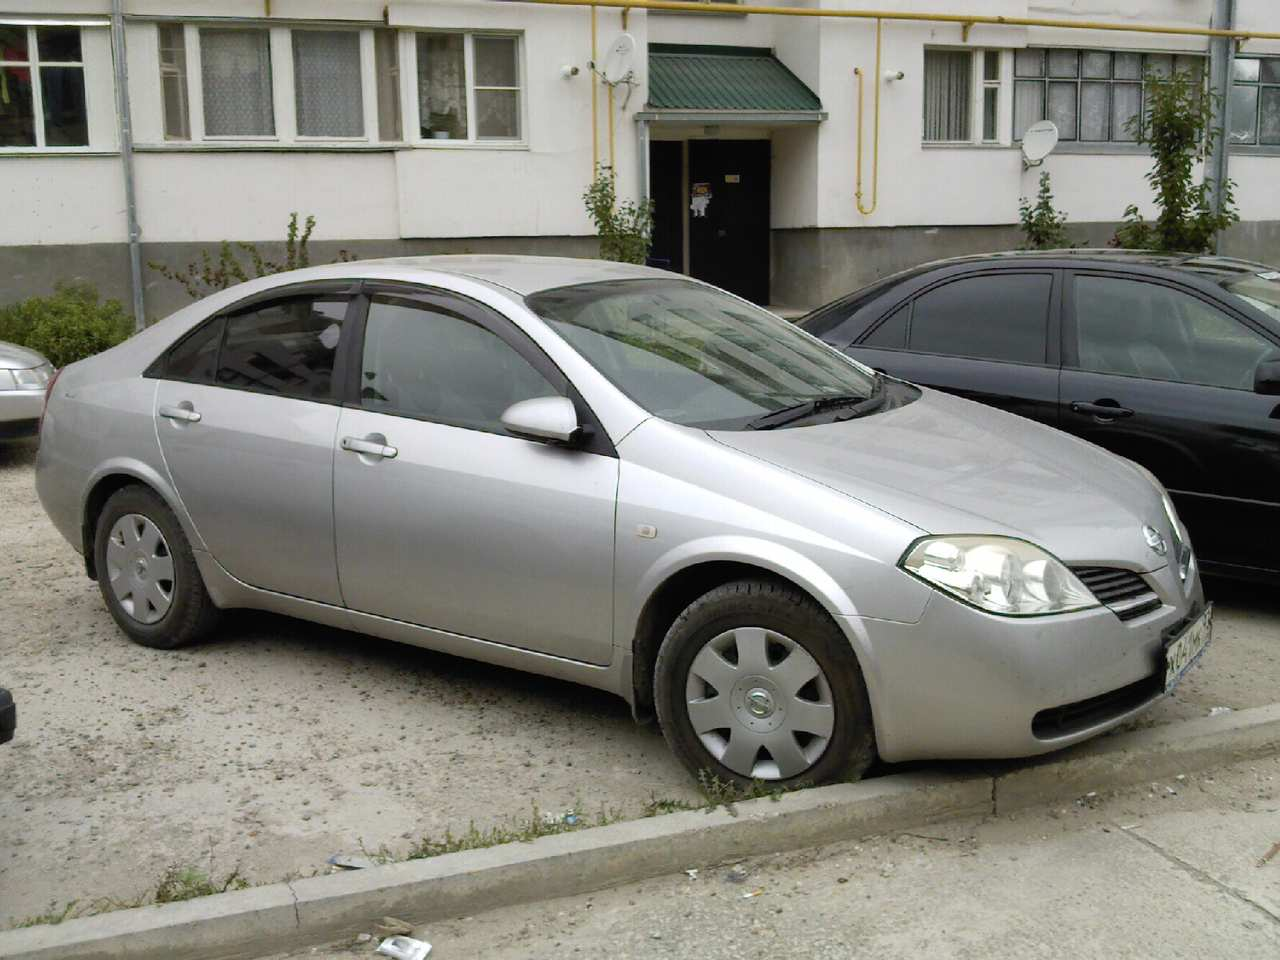 2003 Nissan Primera Pictures, 1.8l., Gasoline, FF, Automatic For Sale